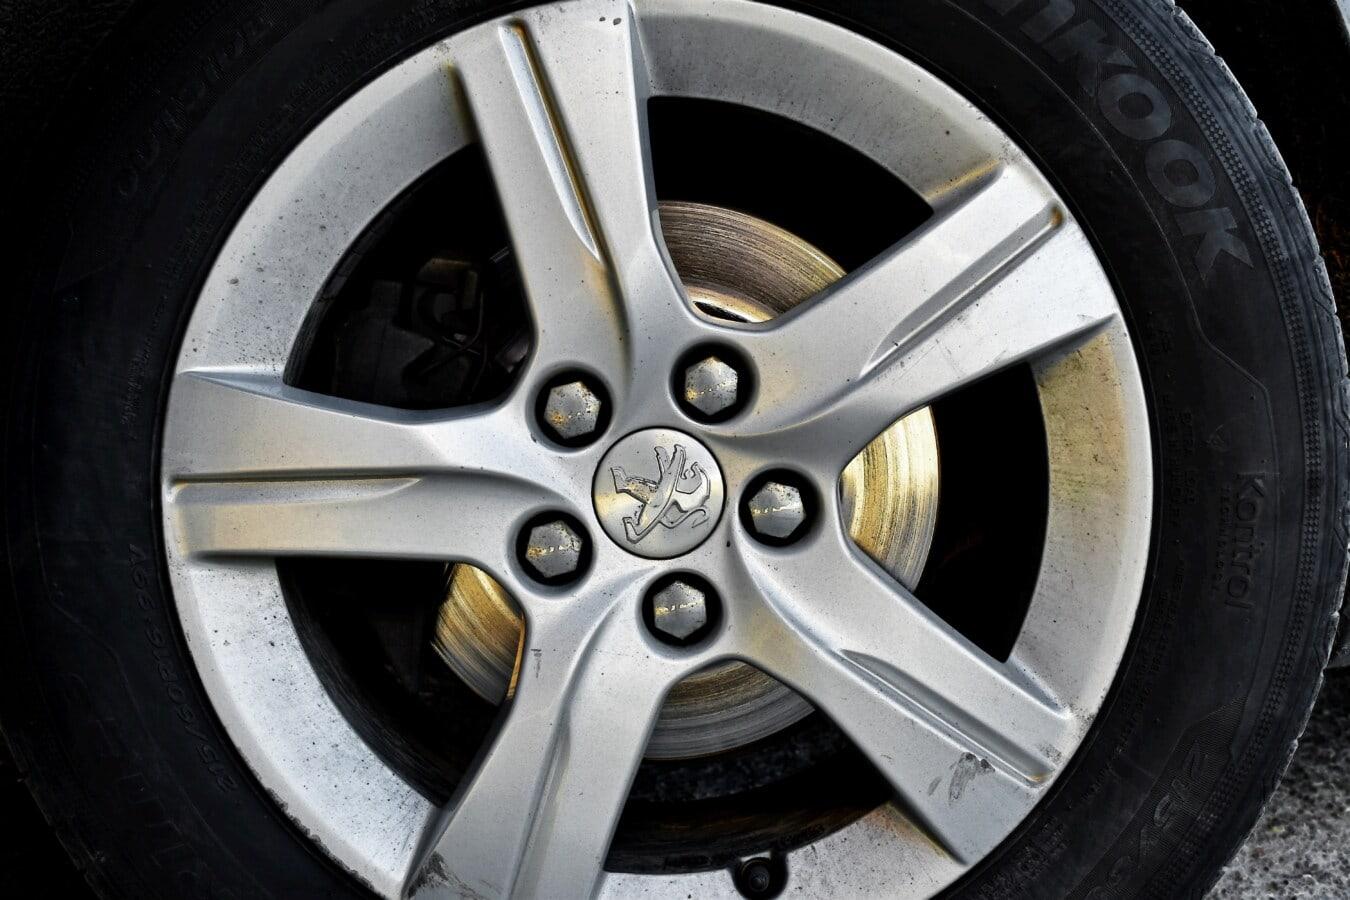 pneu, roue, jante, transport, véhicule, voiture, automobile, machine, frein, Garage